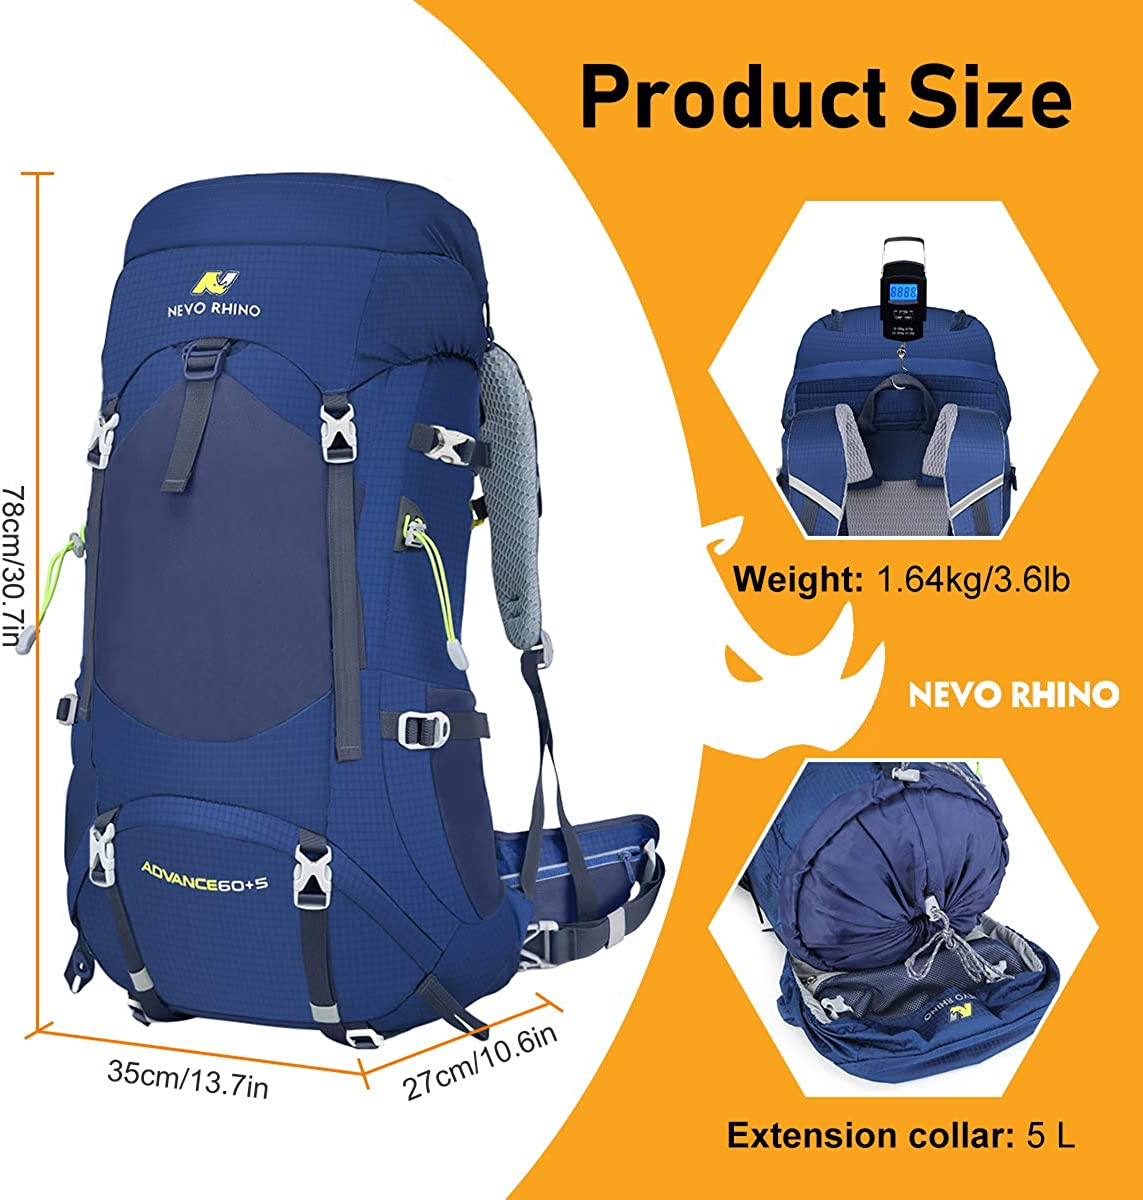 NEVO Rhino 65L Internal Frame Backpack,Ultralight Waterproof Daypack for Hiking Camping